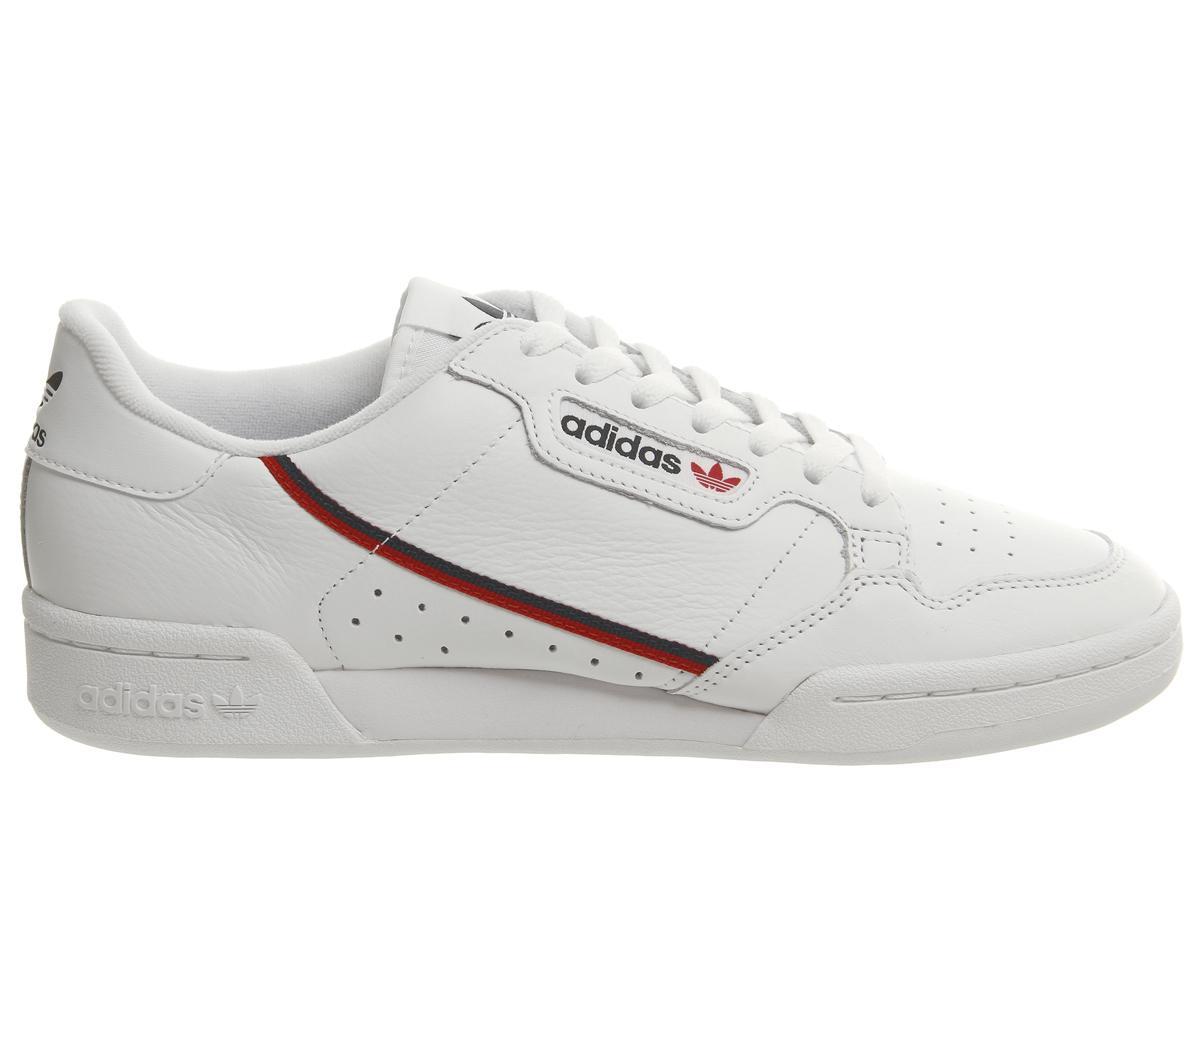 adidas Continental 80s Trainers White Scarlett Collegiate